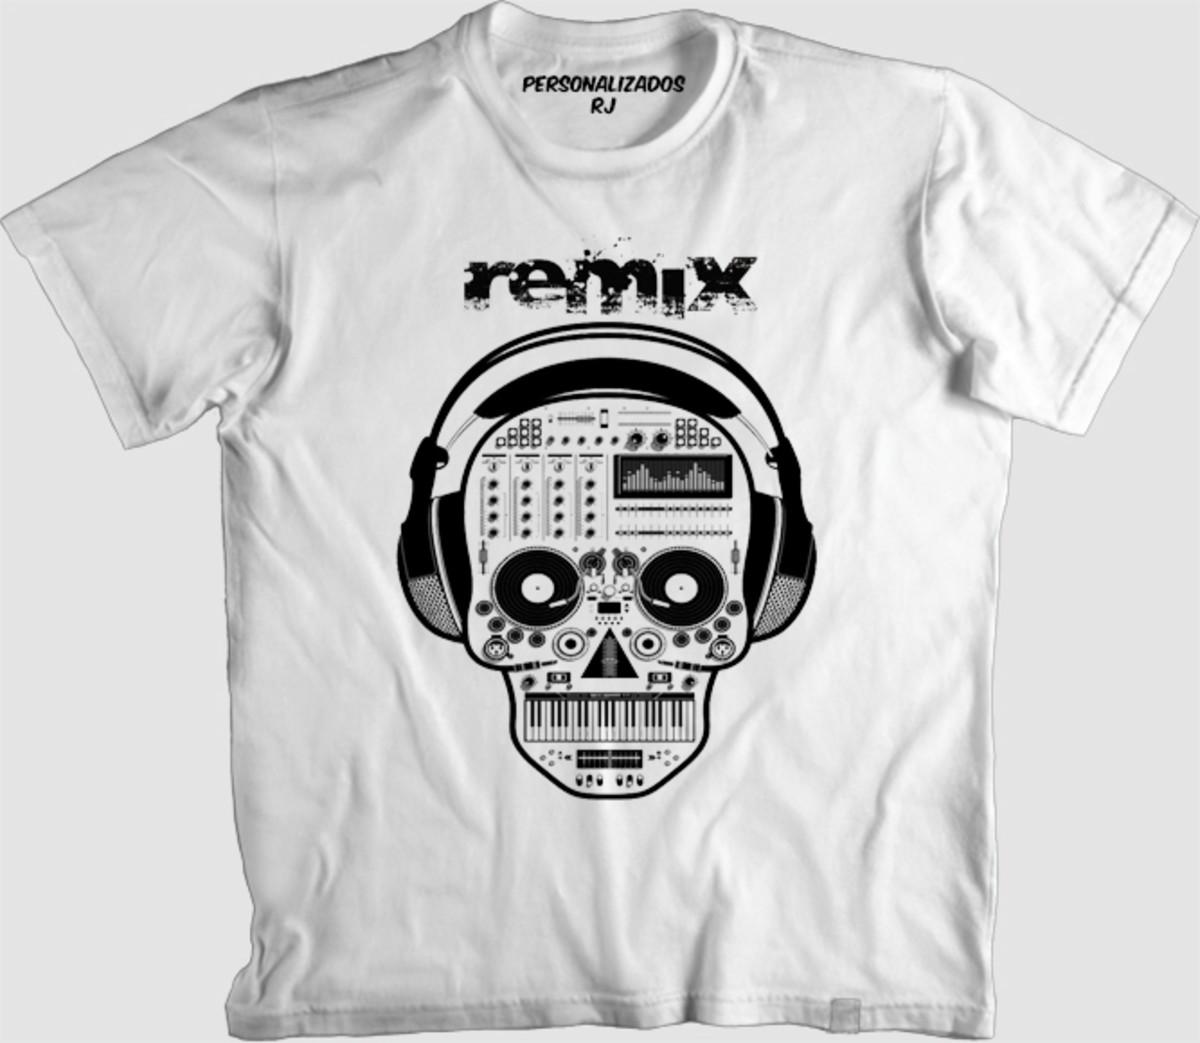 Camisa REMIX no Elo7  ca341a49de6